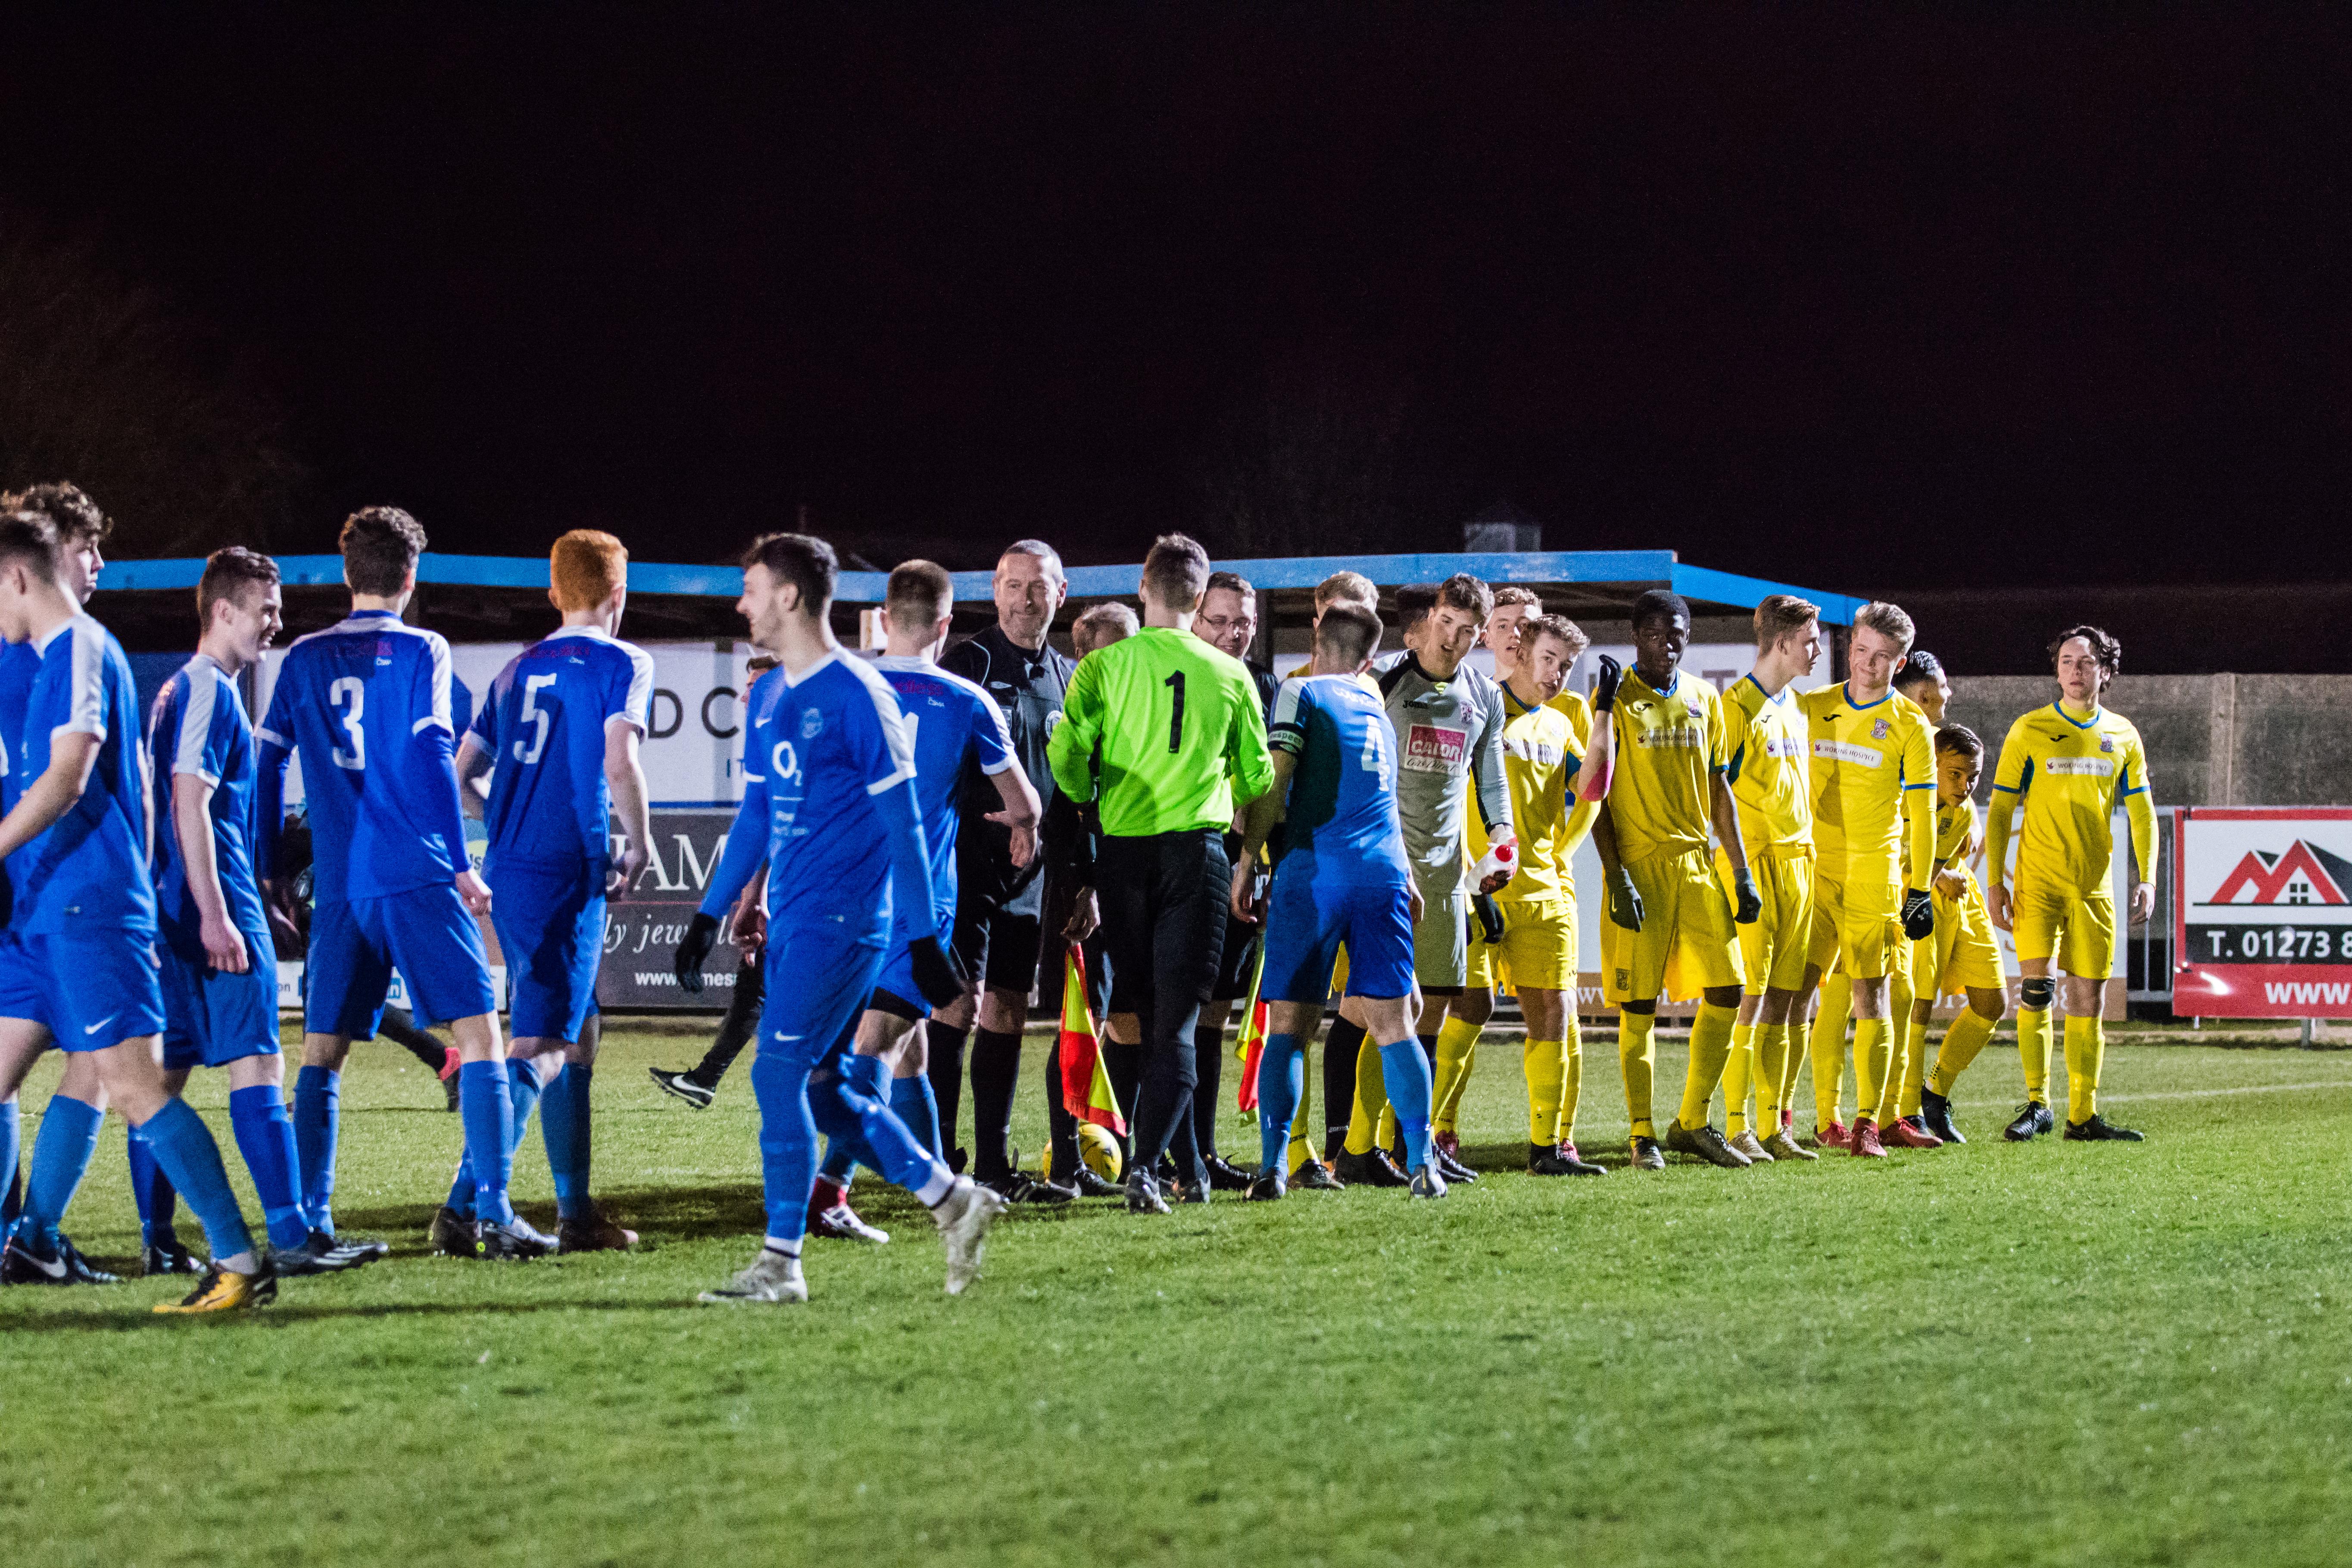 DAVID_JEFFERY Shoreham FC U18s vs Woking FC Academy 22.03.18 15